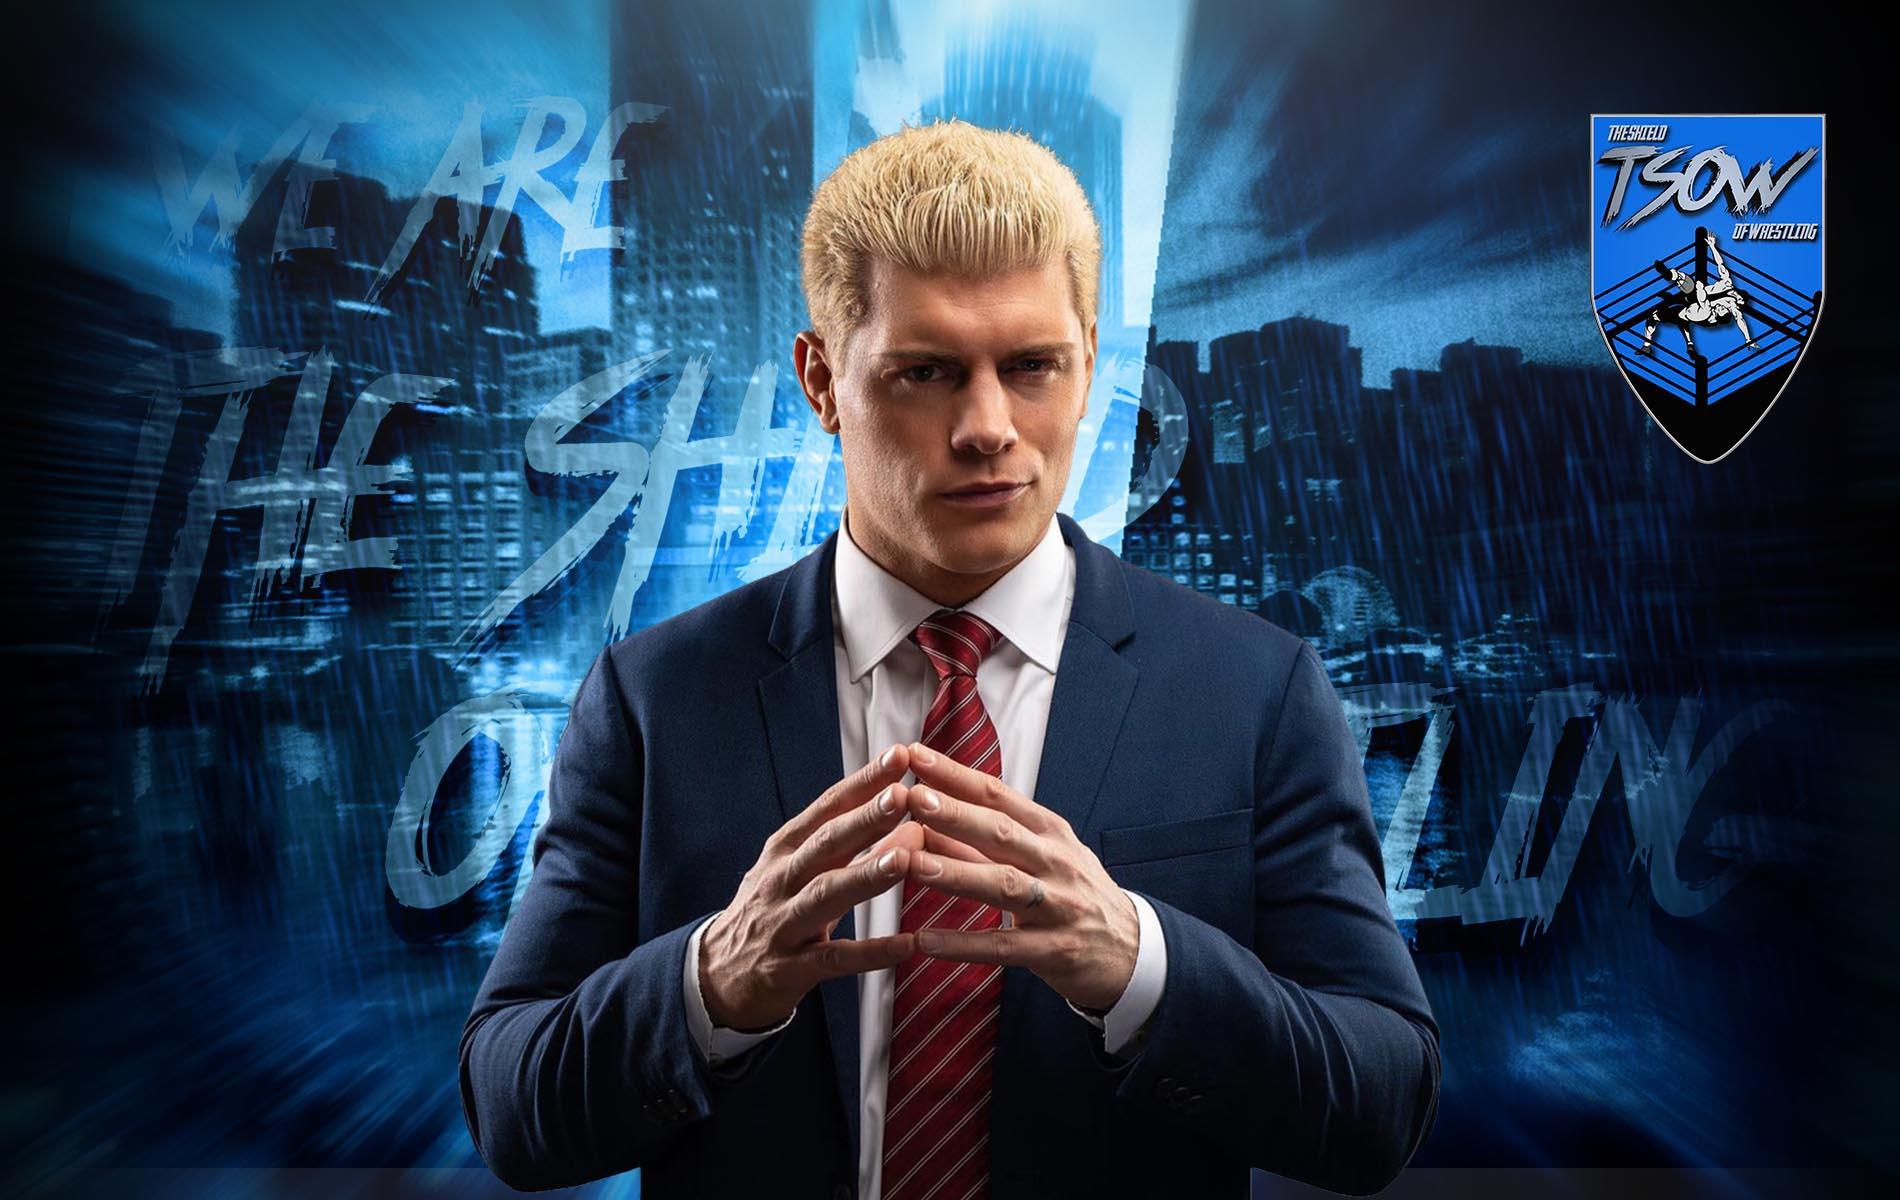 Cody Rhodes conferma che Sammy Guevara tornerà in AEW